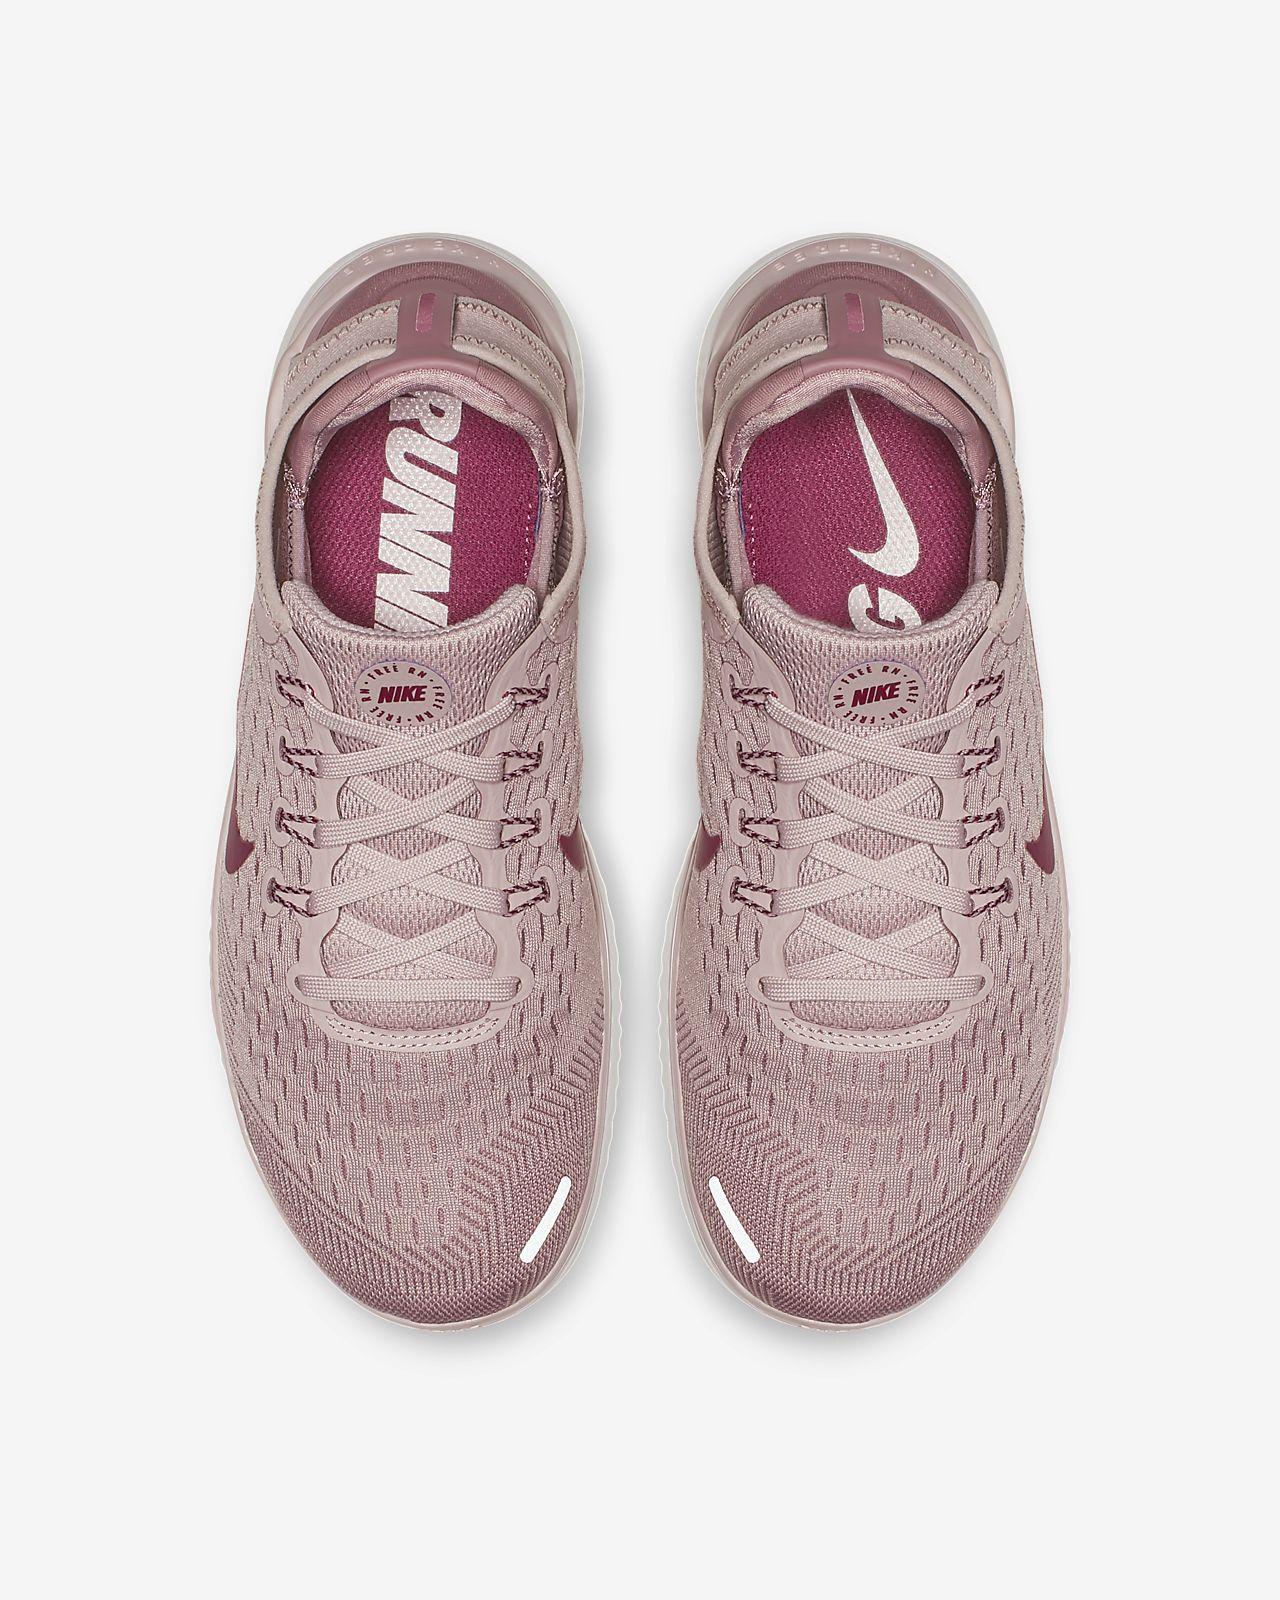 ad8675b0084d2 Nike Free RN 2018 Women s Running Shoe. Nike.com SG